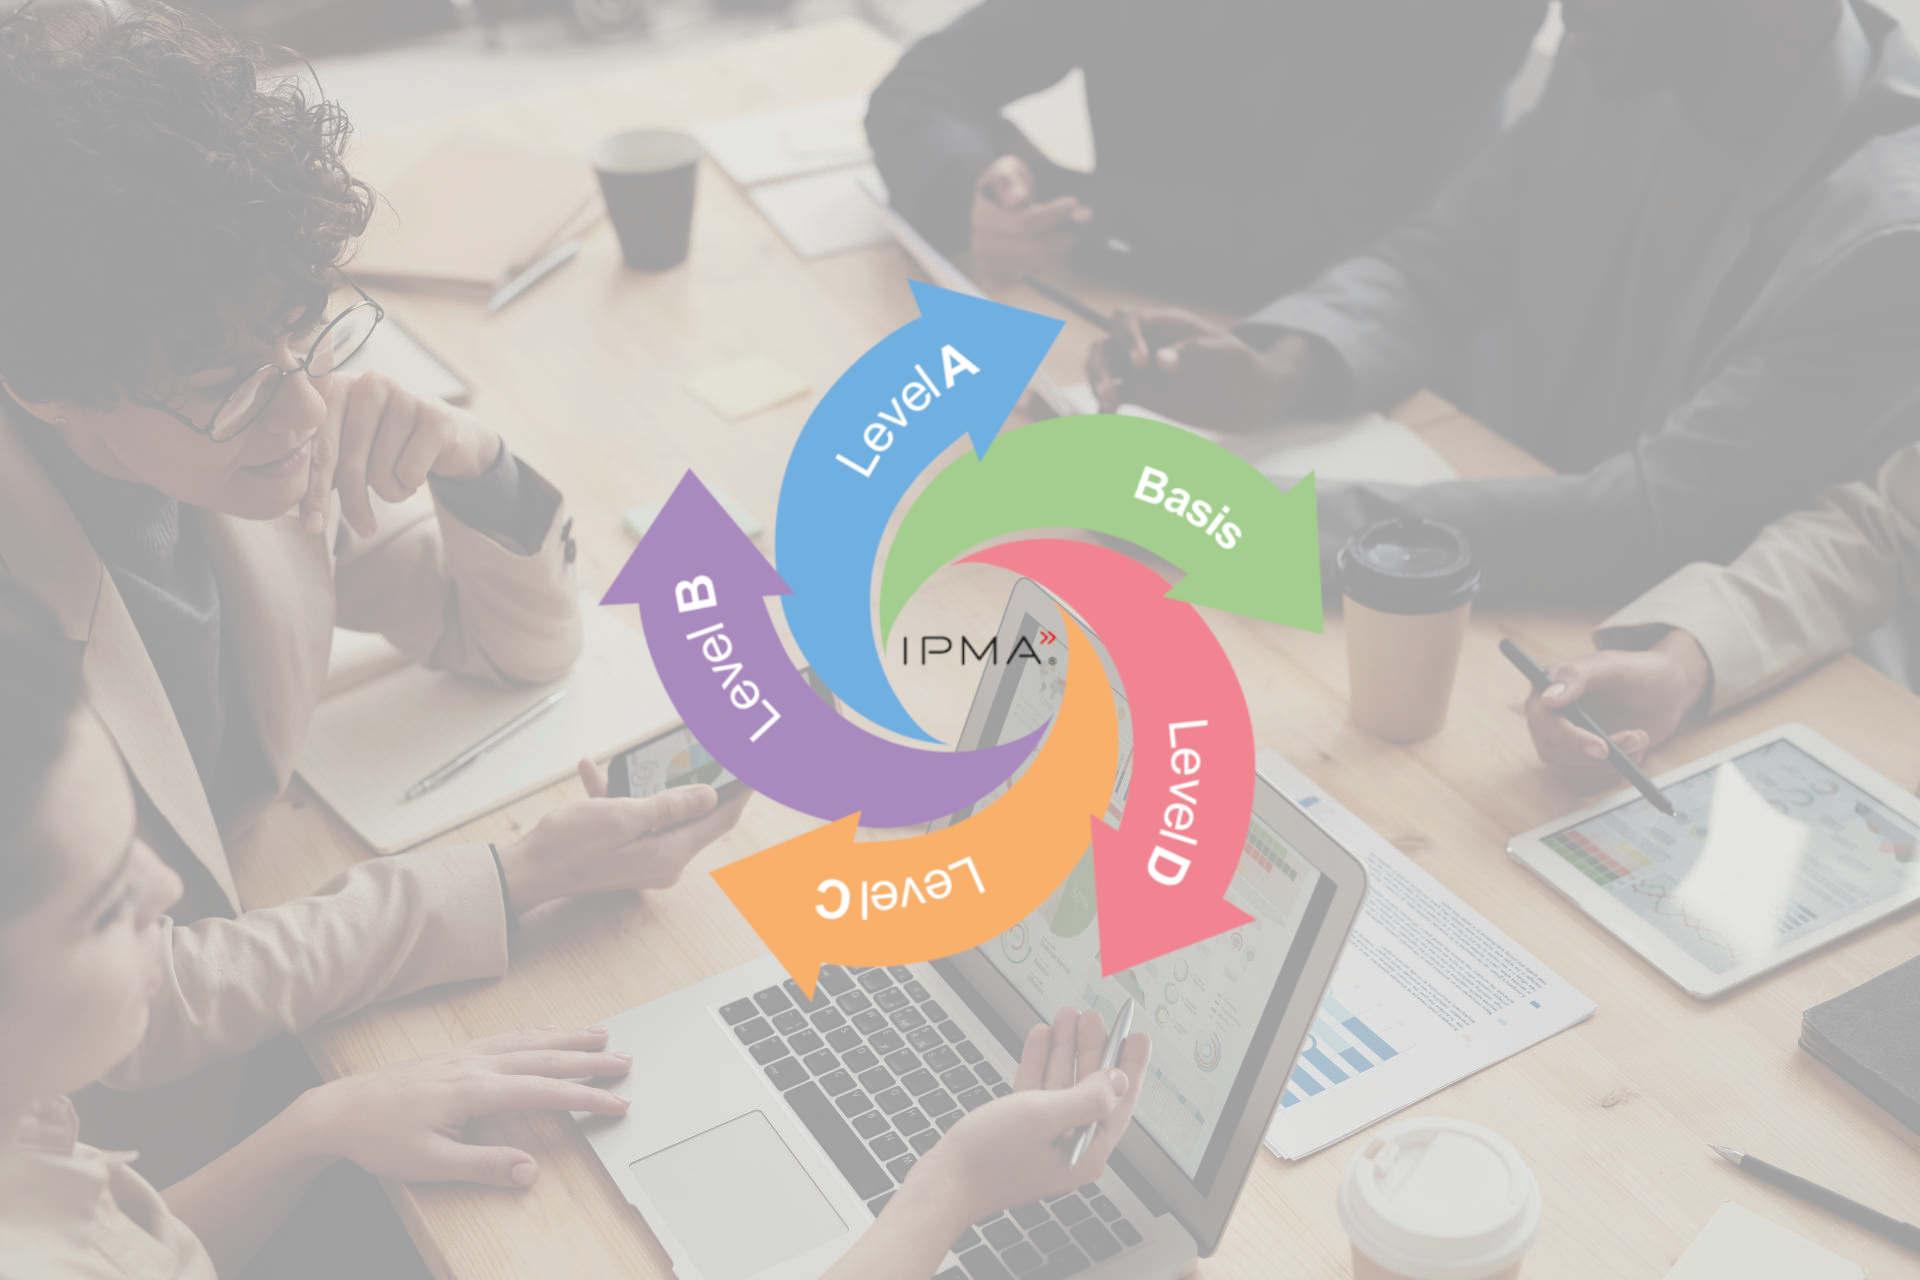 Offering IPMA